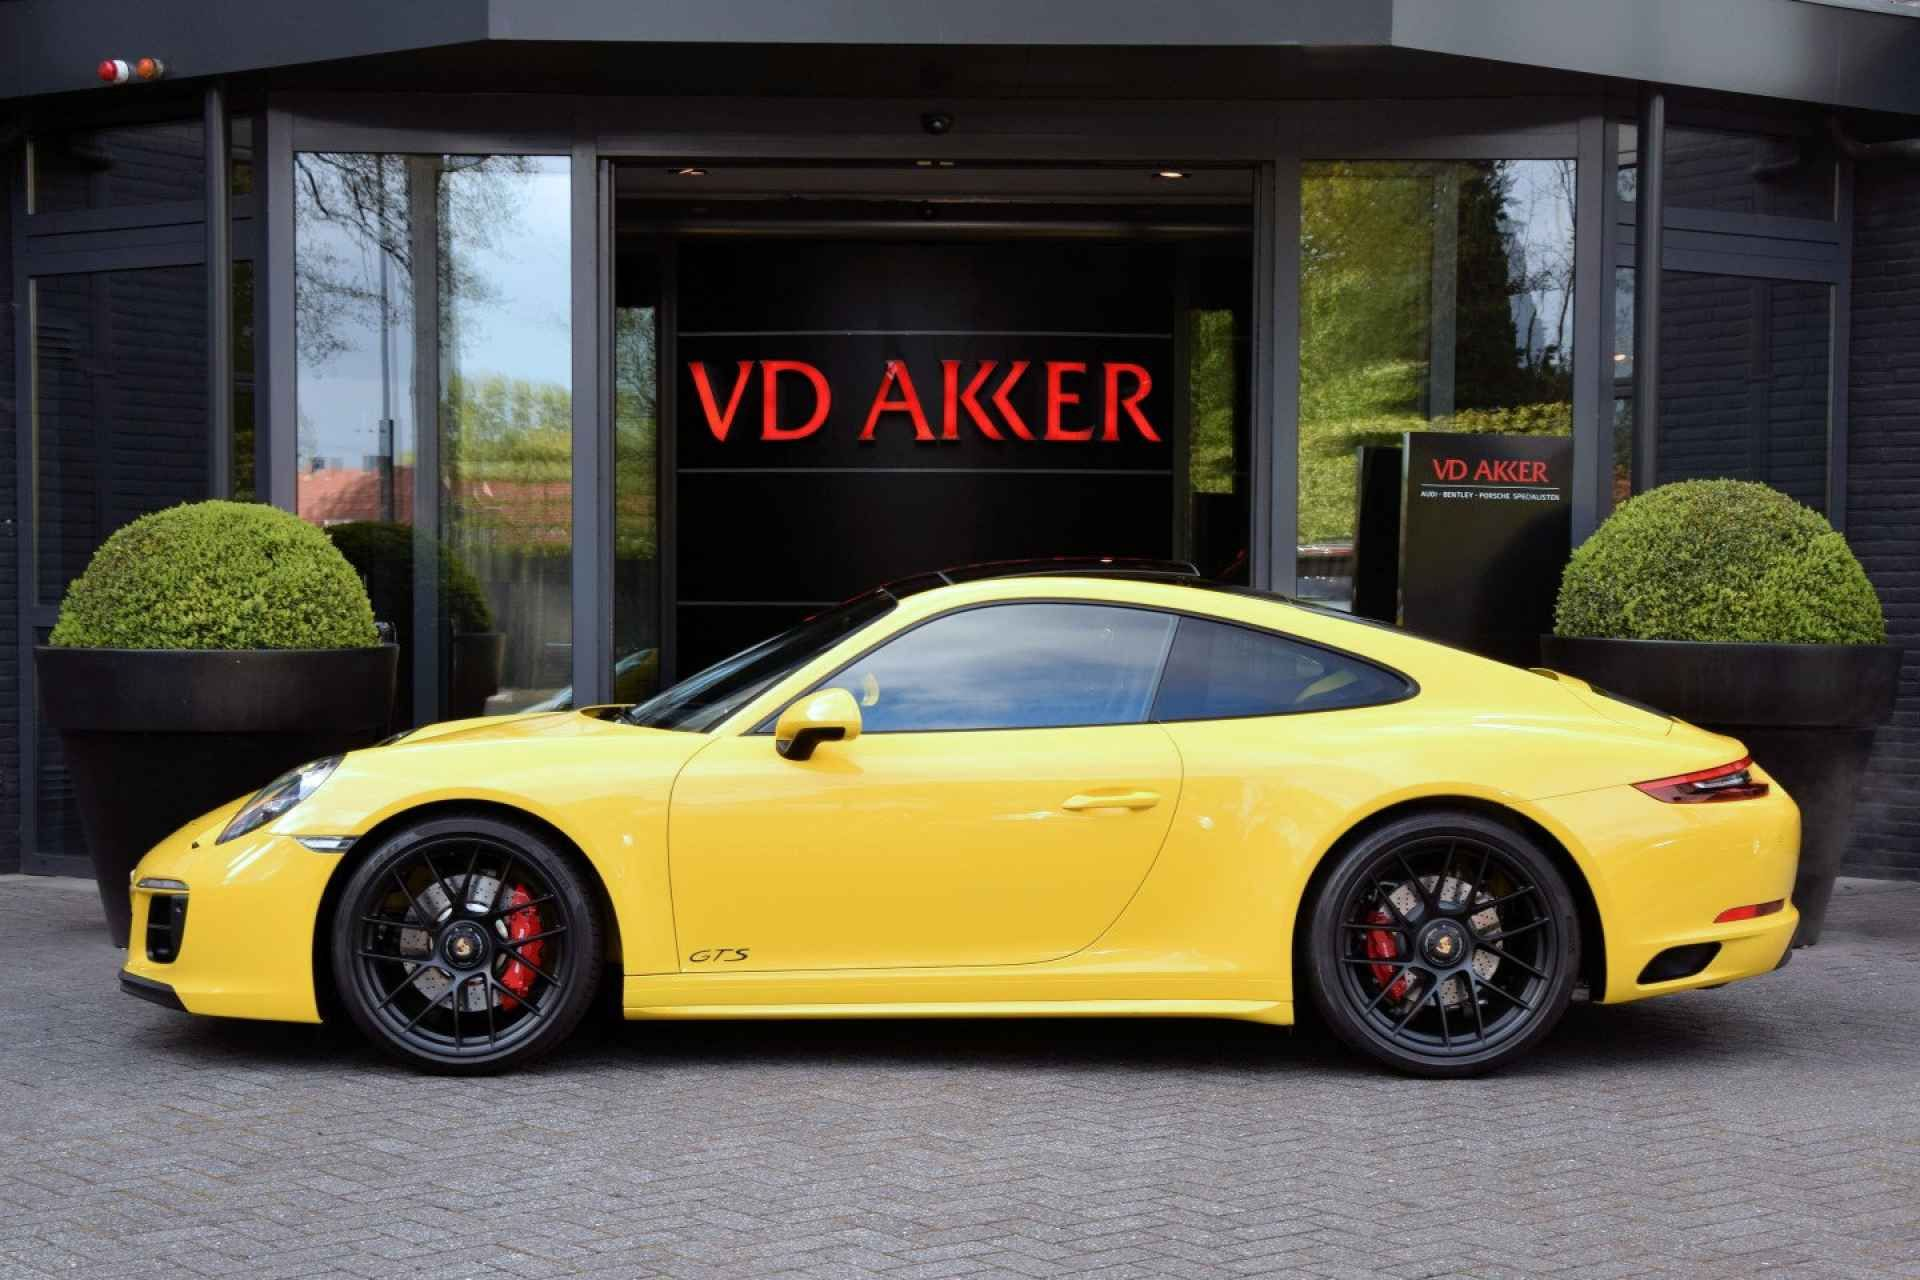 Occasion Porsche 911 991 Carrera 4 Gts 177 450 Benzine Automaat X2f Pdk Coupe Porsche 911 Porsche 991 Porsche